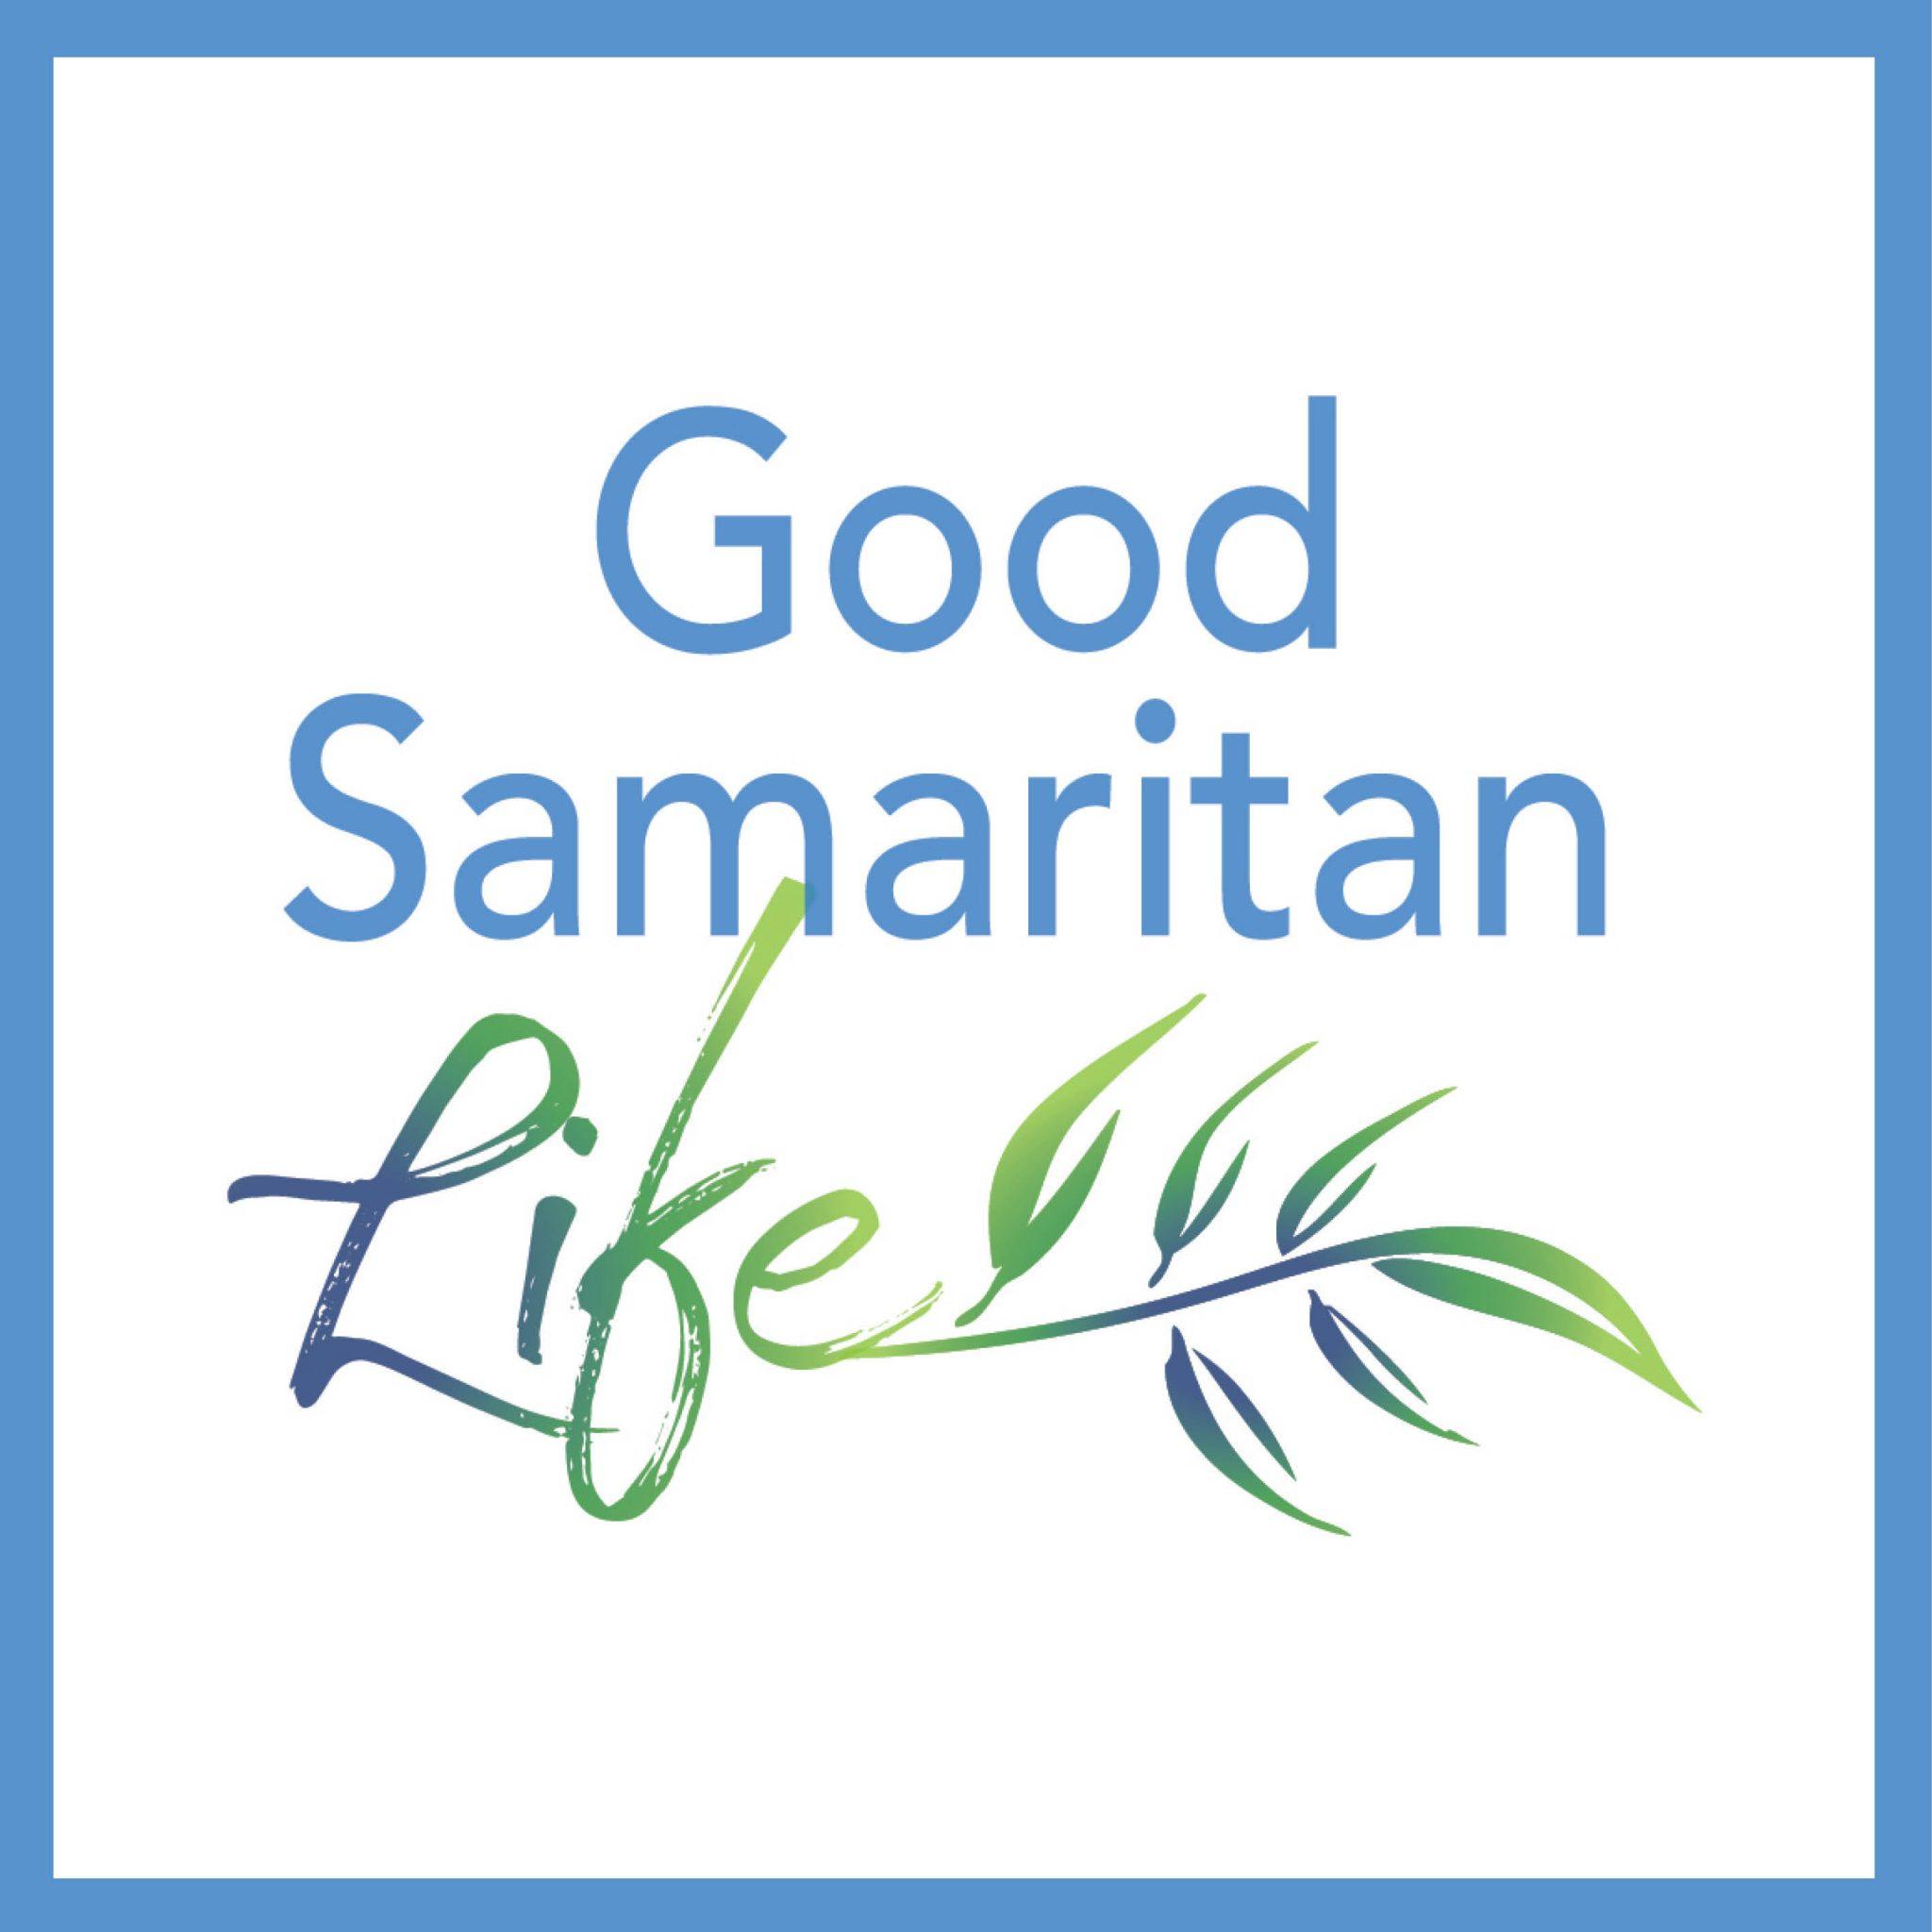 https://www.goodsamaritanlife.org.au/